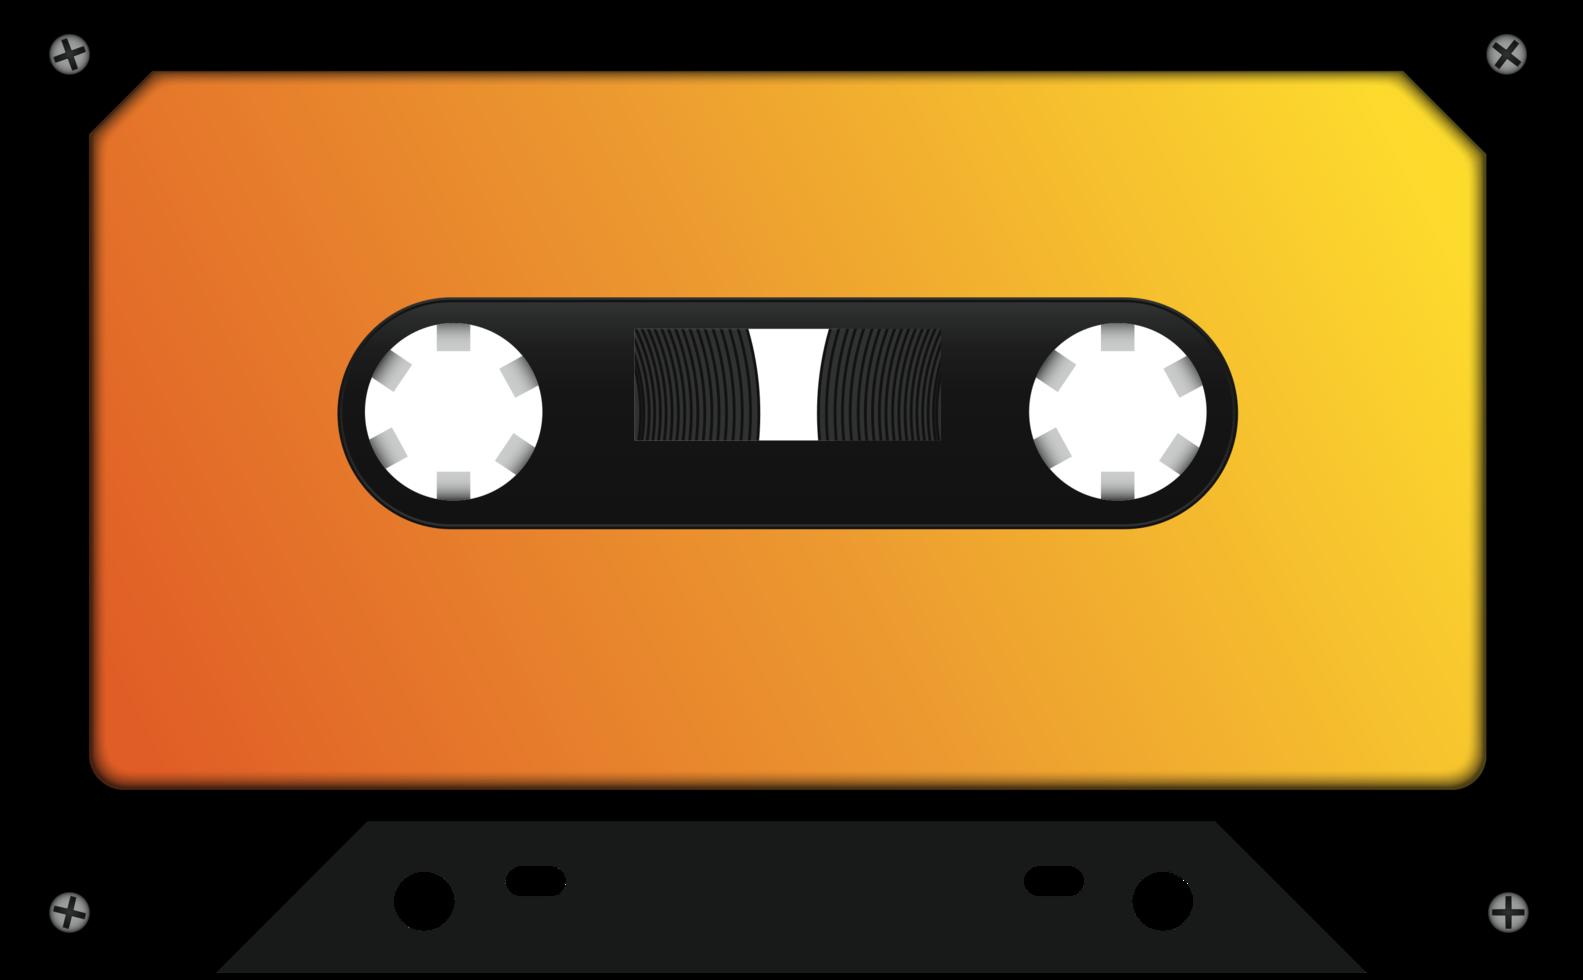 cinta de cassette realista png